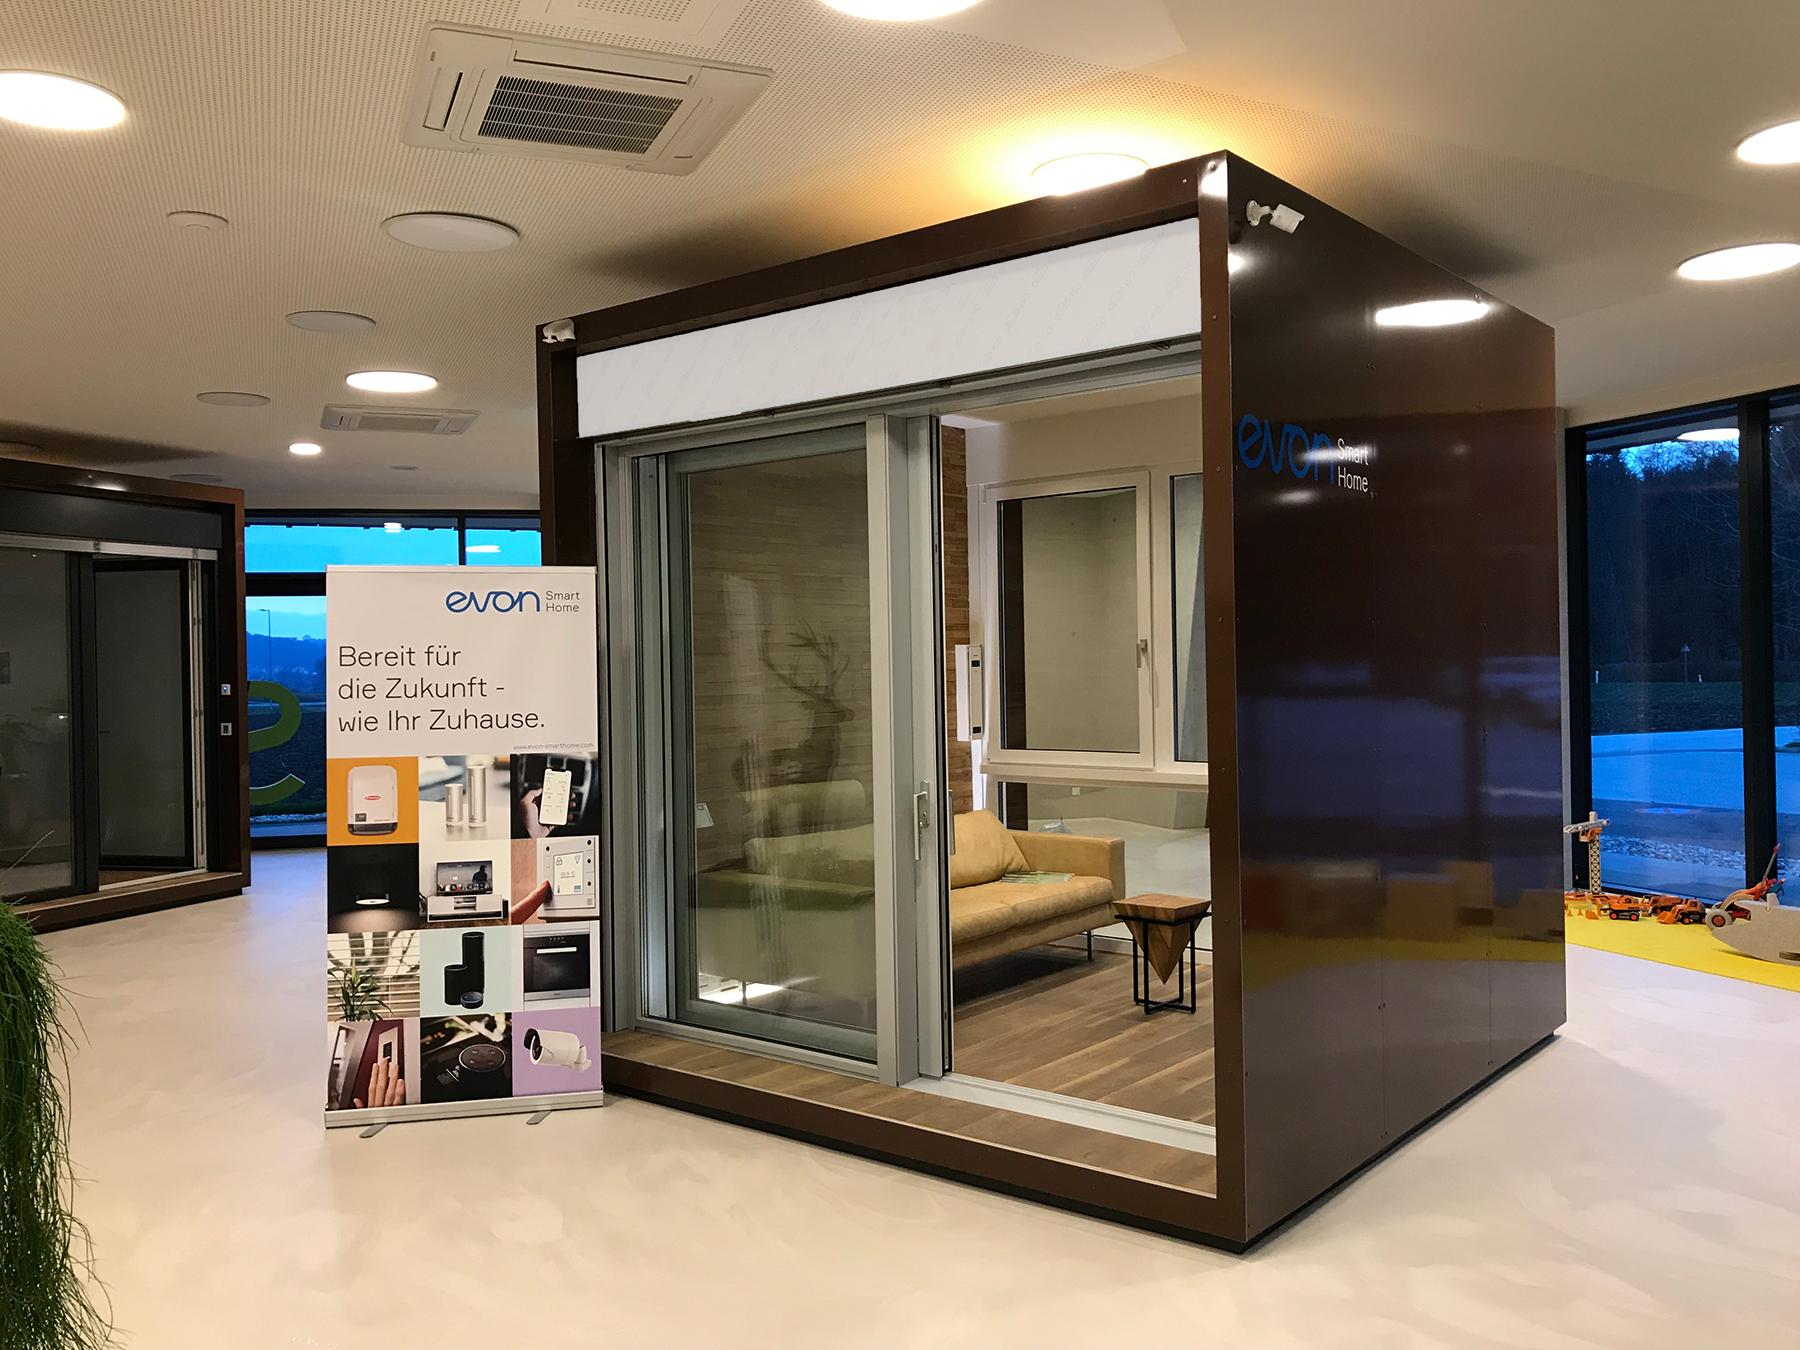 evon Smart Home Oasis Wohnwelt